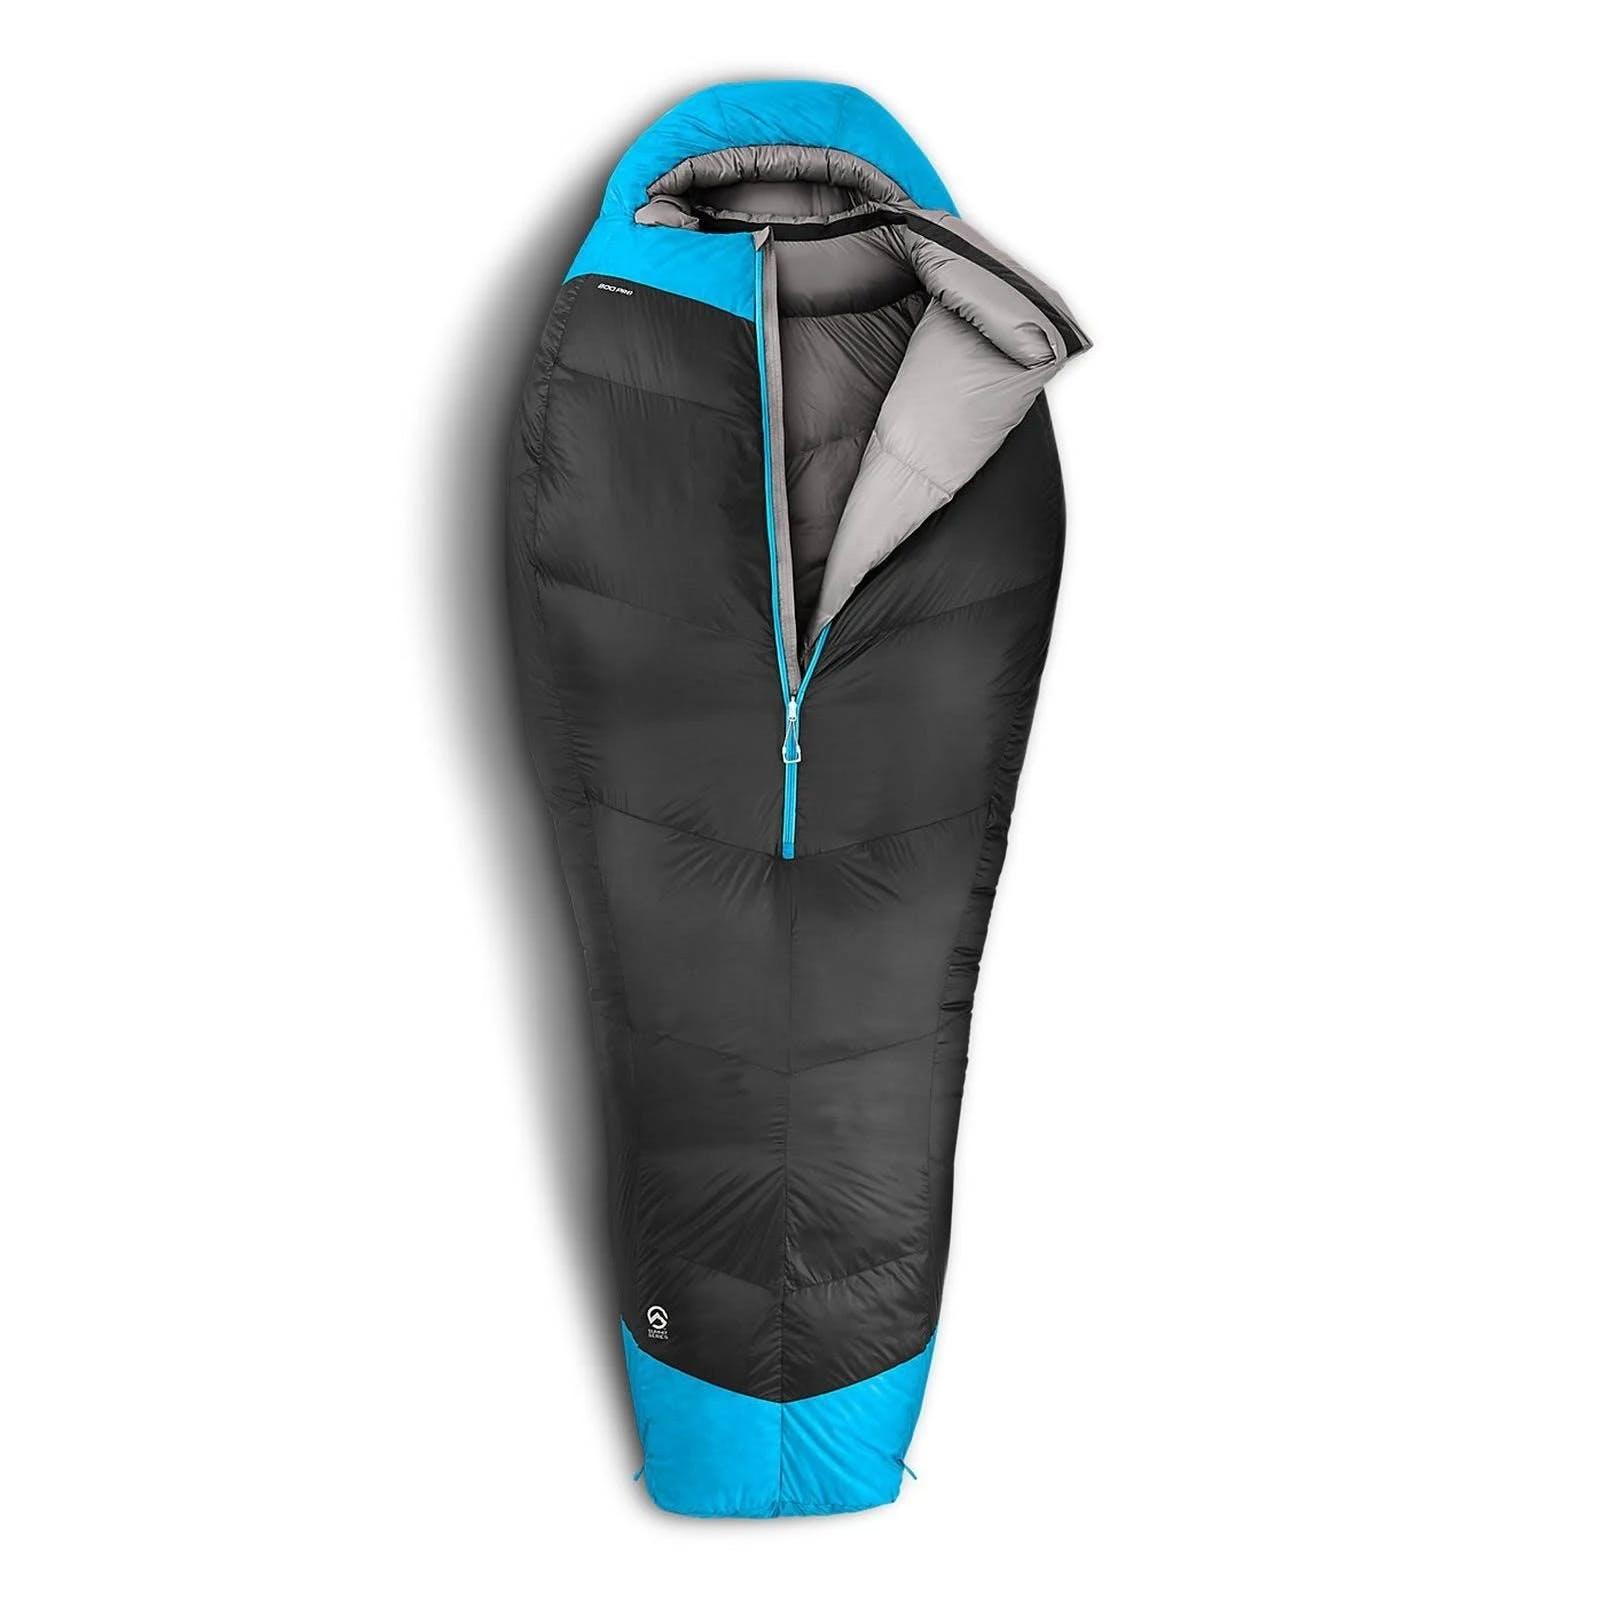 The North Face Inferno 15F Sleeping Bag - Regular